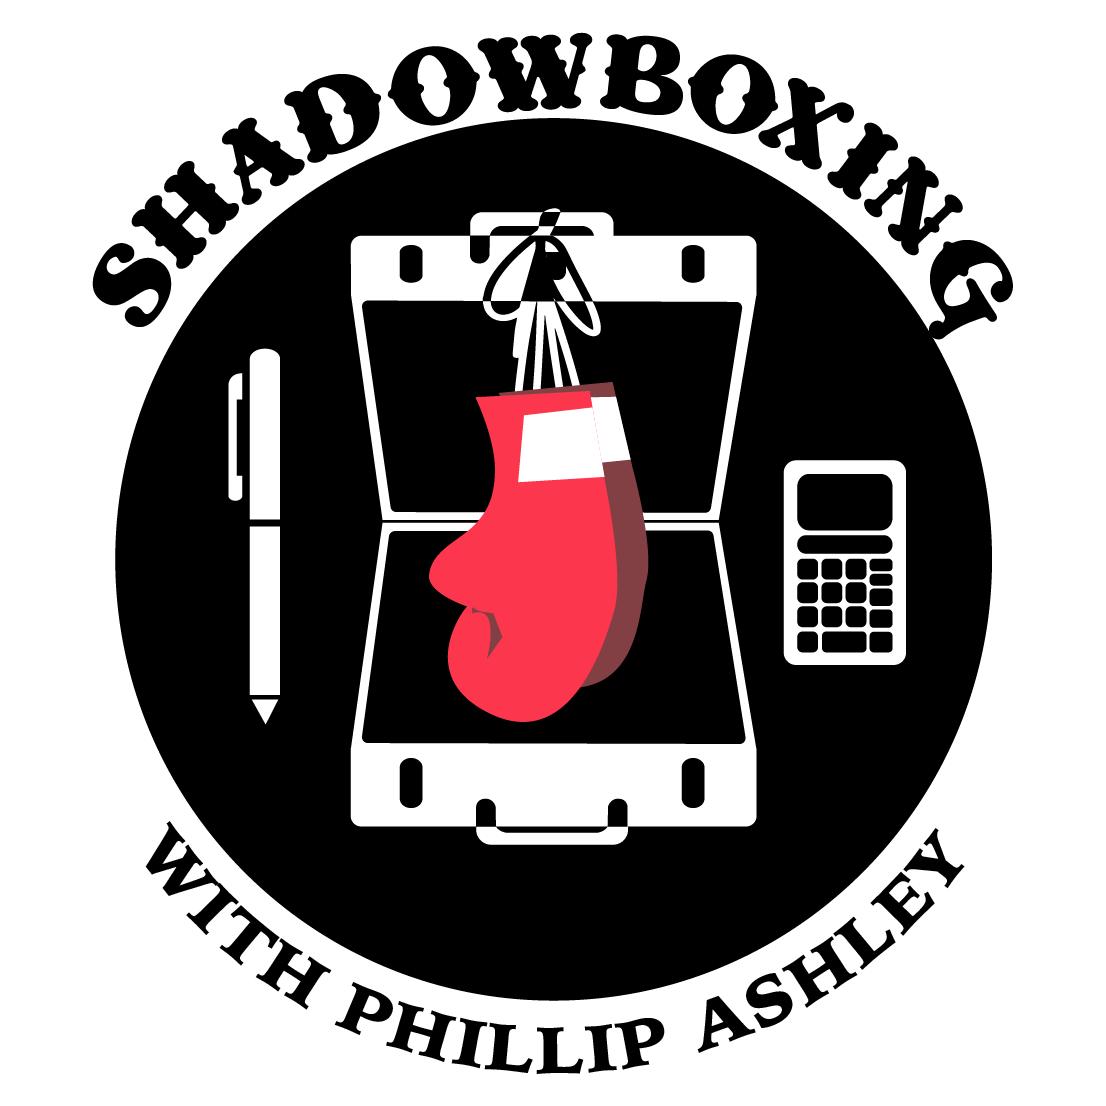 shadowboxinglogoSite.png